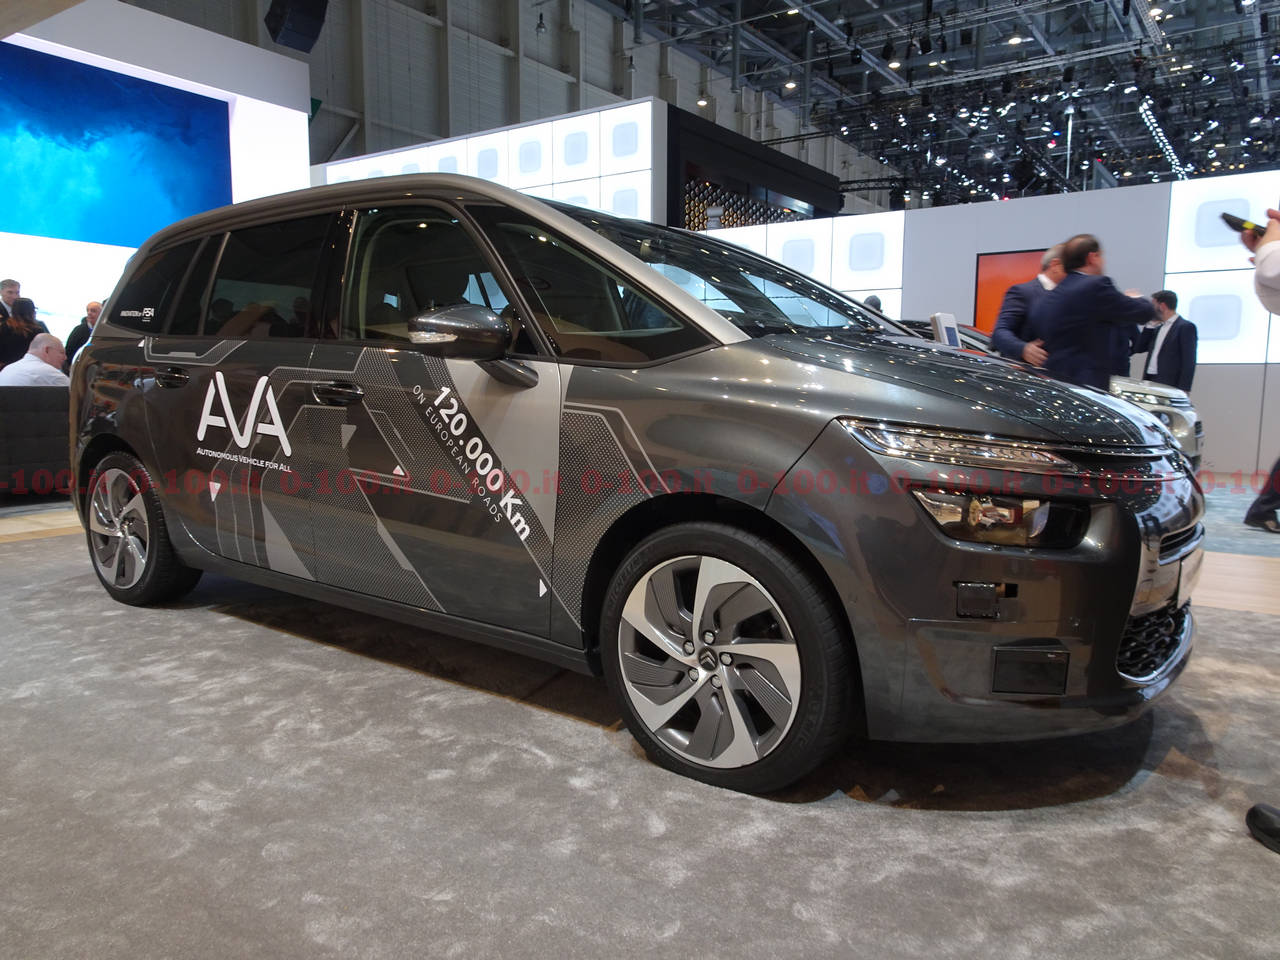 Ginevra-geneva-geneve-2017-Citroën-SpaceTourer-c4-grand-picasso-guida-autonoma-0-100_2